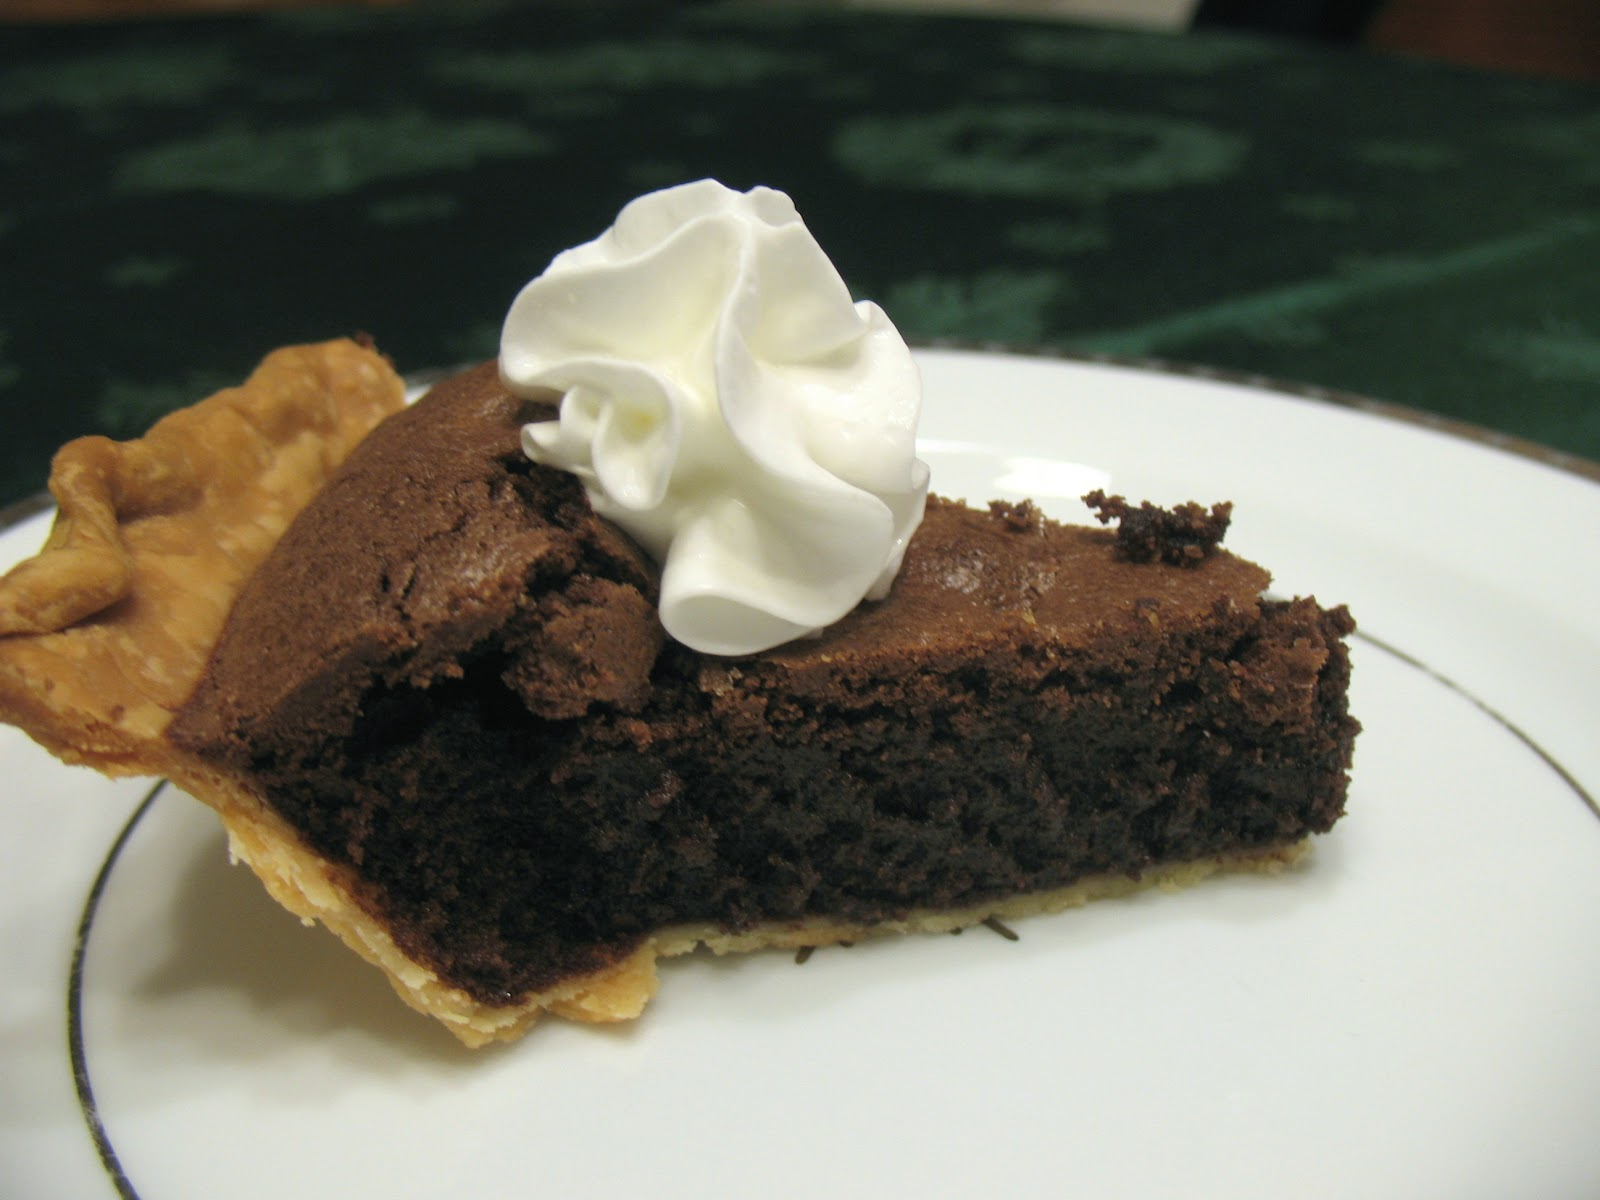 pie a la mode brownie pie à la mode recipe brownie pie a la mode ...